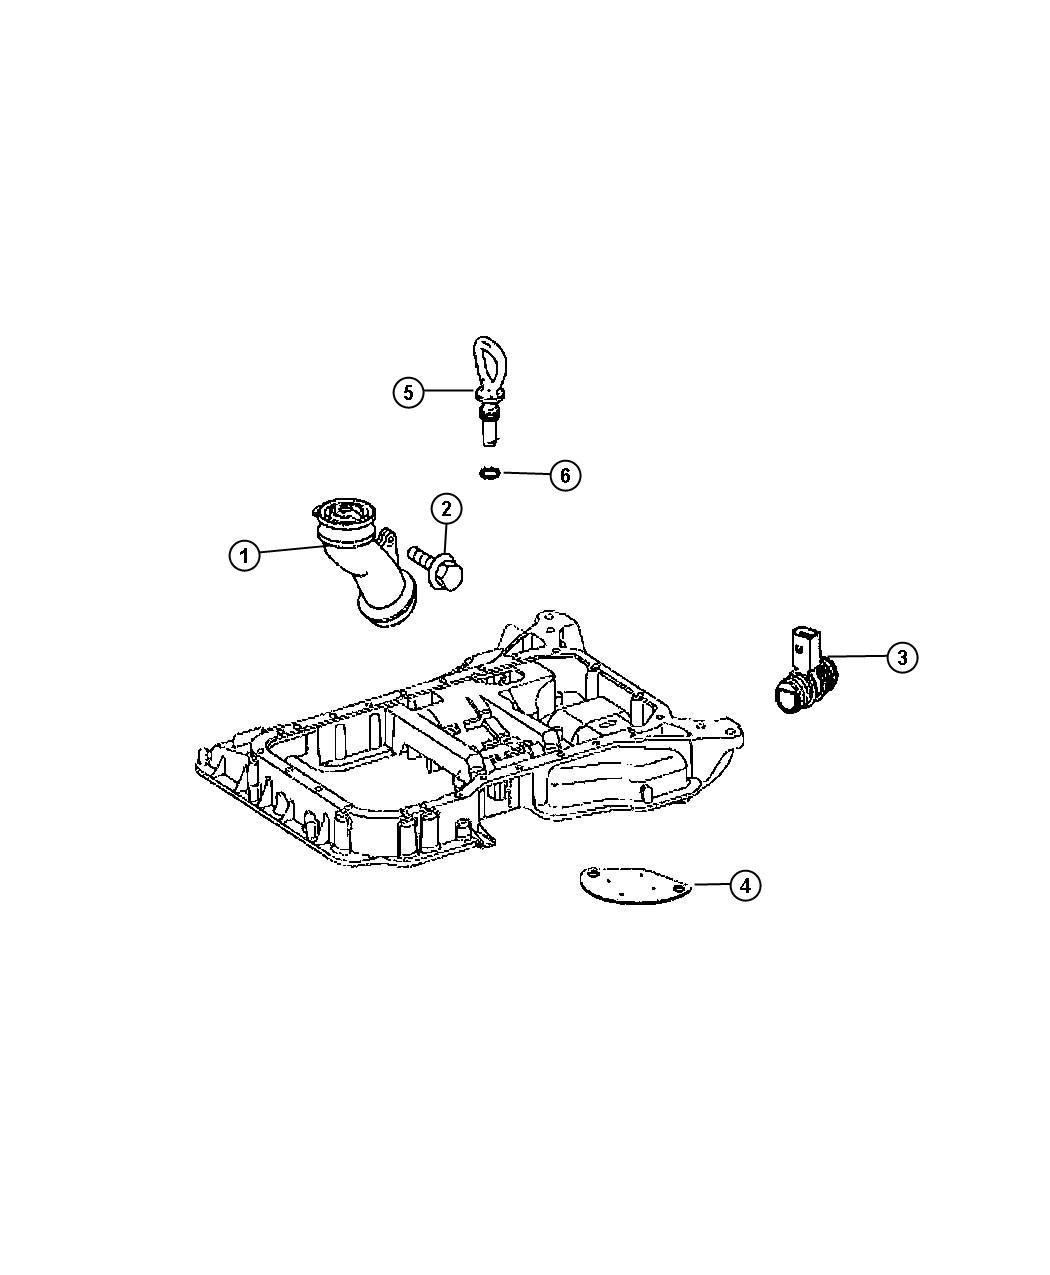 Dodge Sprinter Tube Oil Fill Engine Indicator Pan